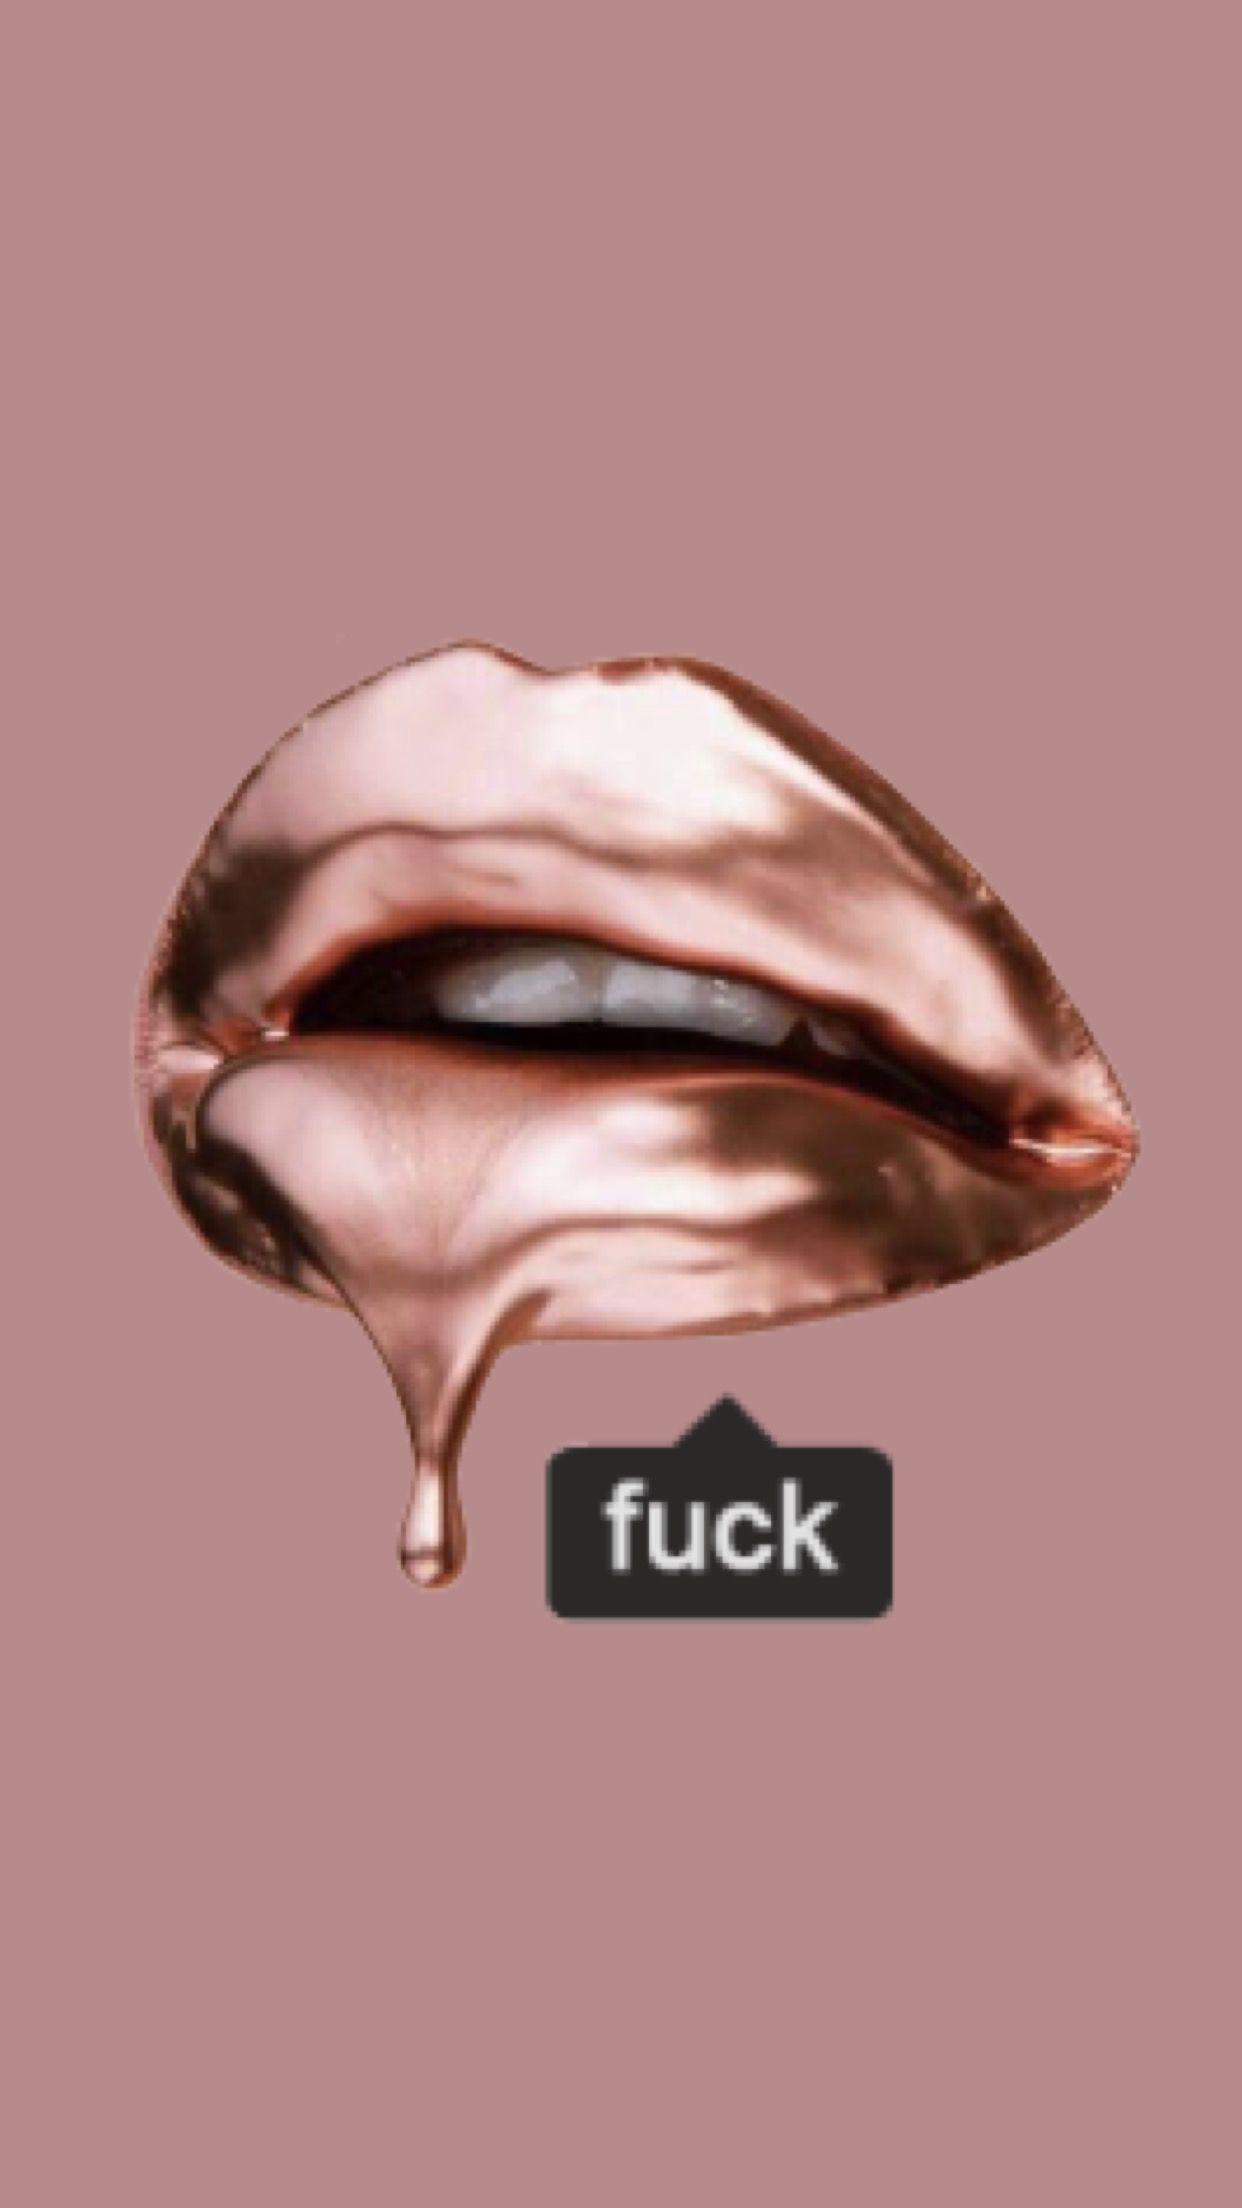 Fuck lips wallpaper made by Laurette